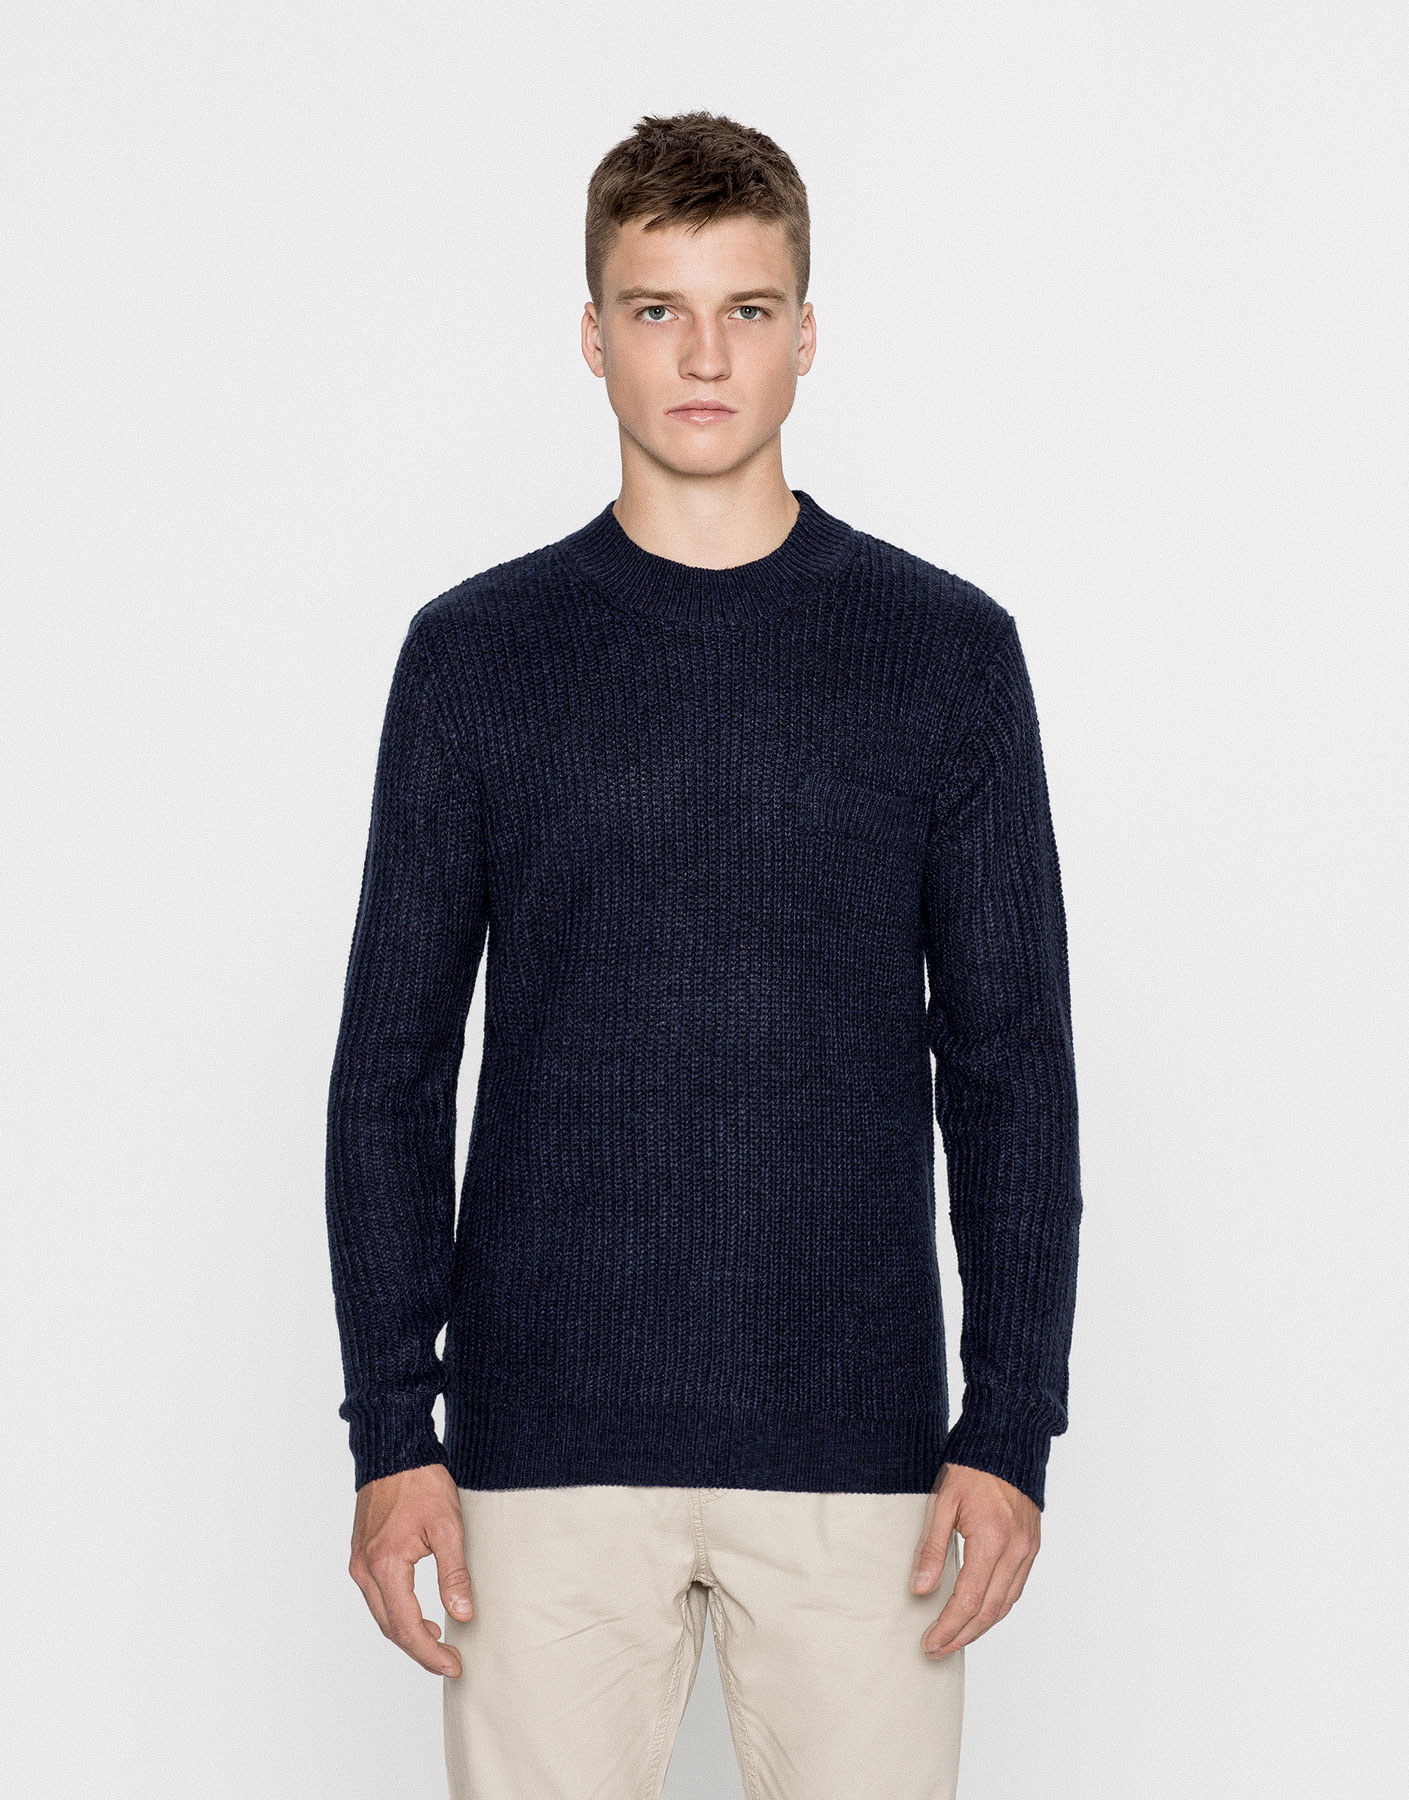 High neck twist knit sweater